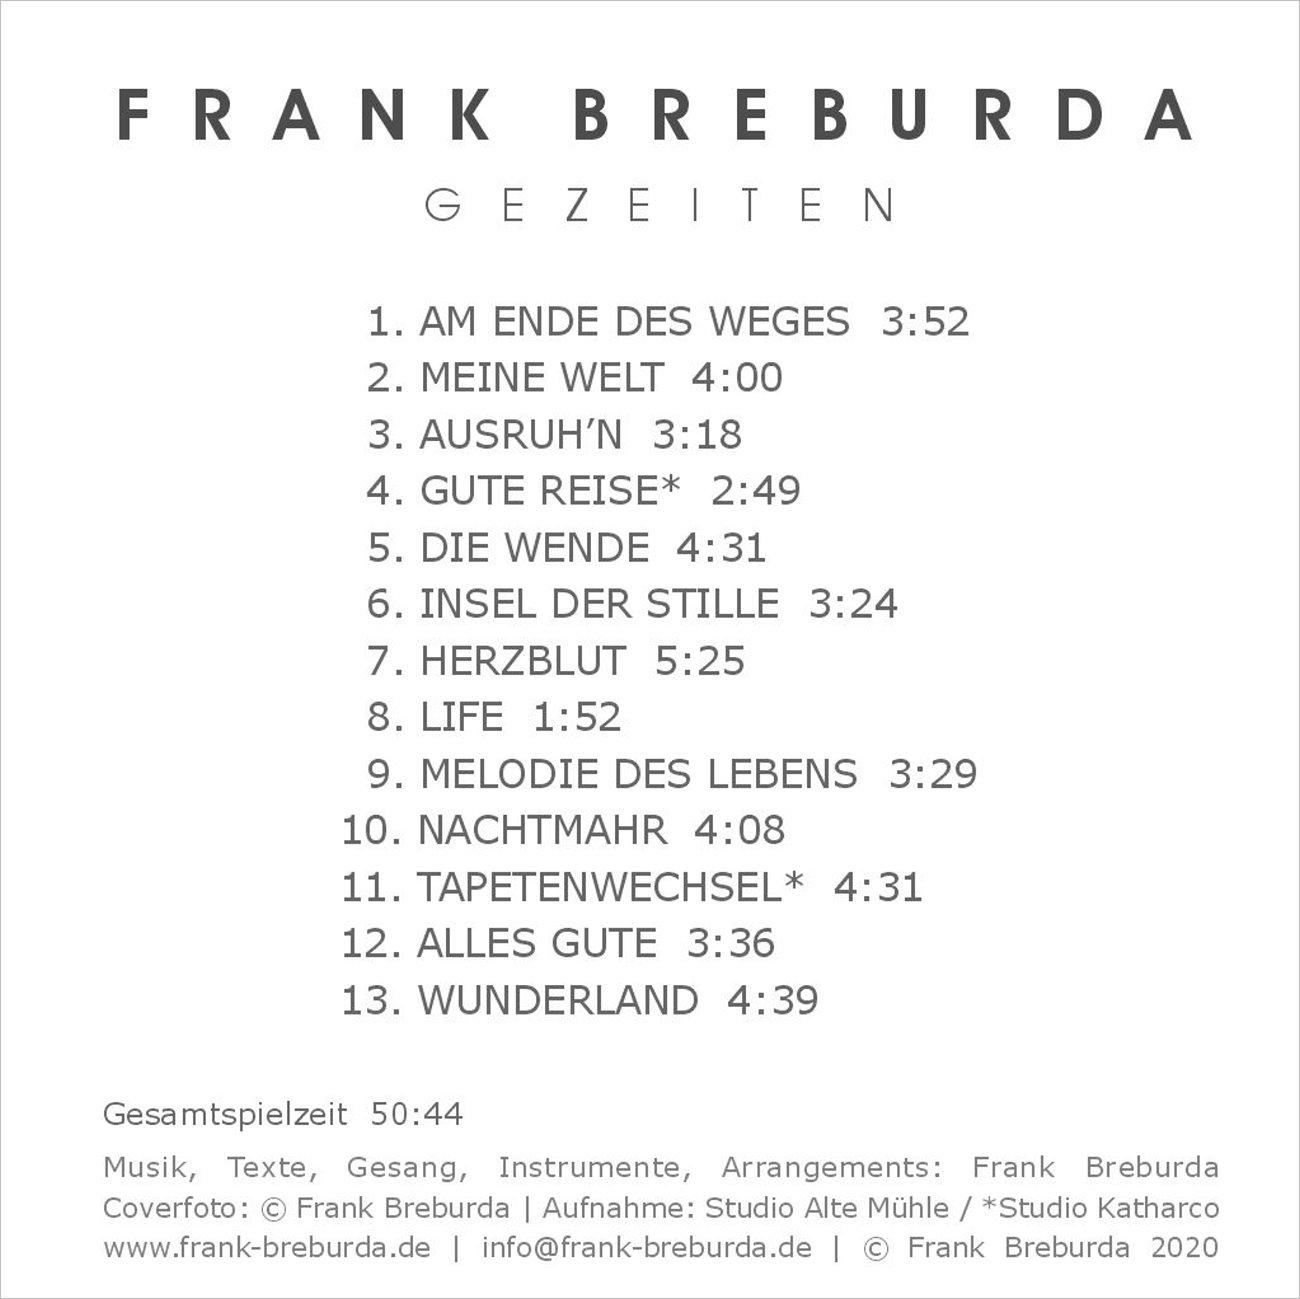 Frank Breburda Liedermacher, GEZEITEN Frank Breburda